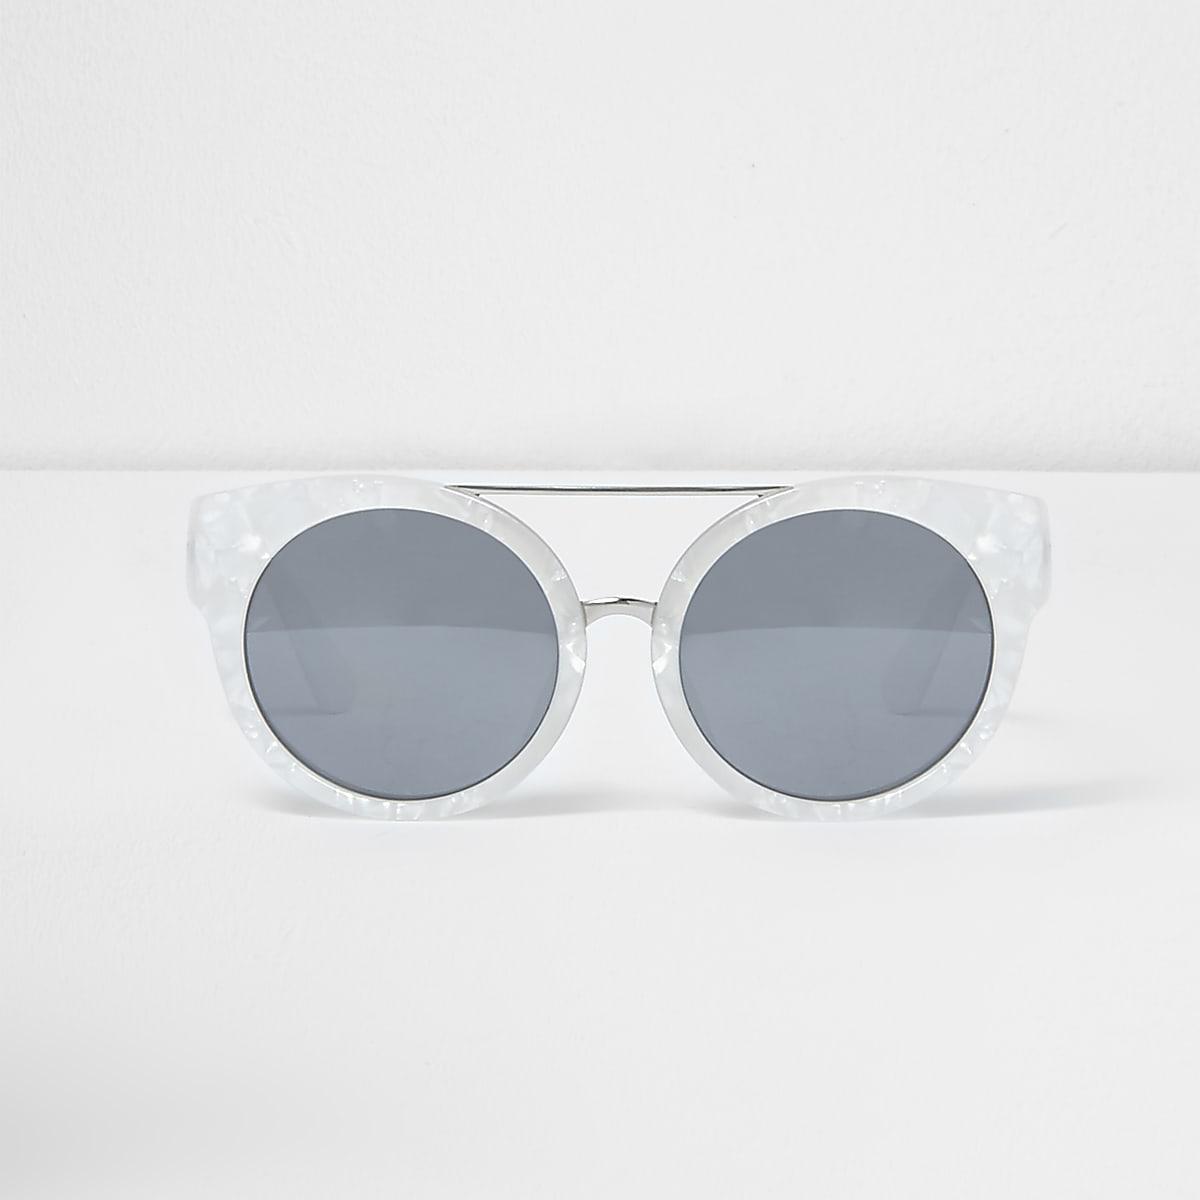 Crèmekleurige cat-eye-zonnebril